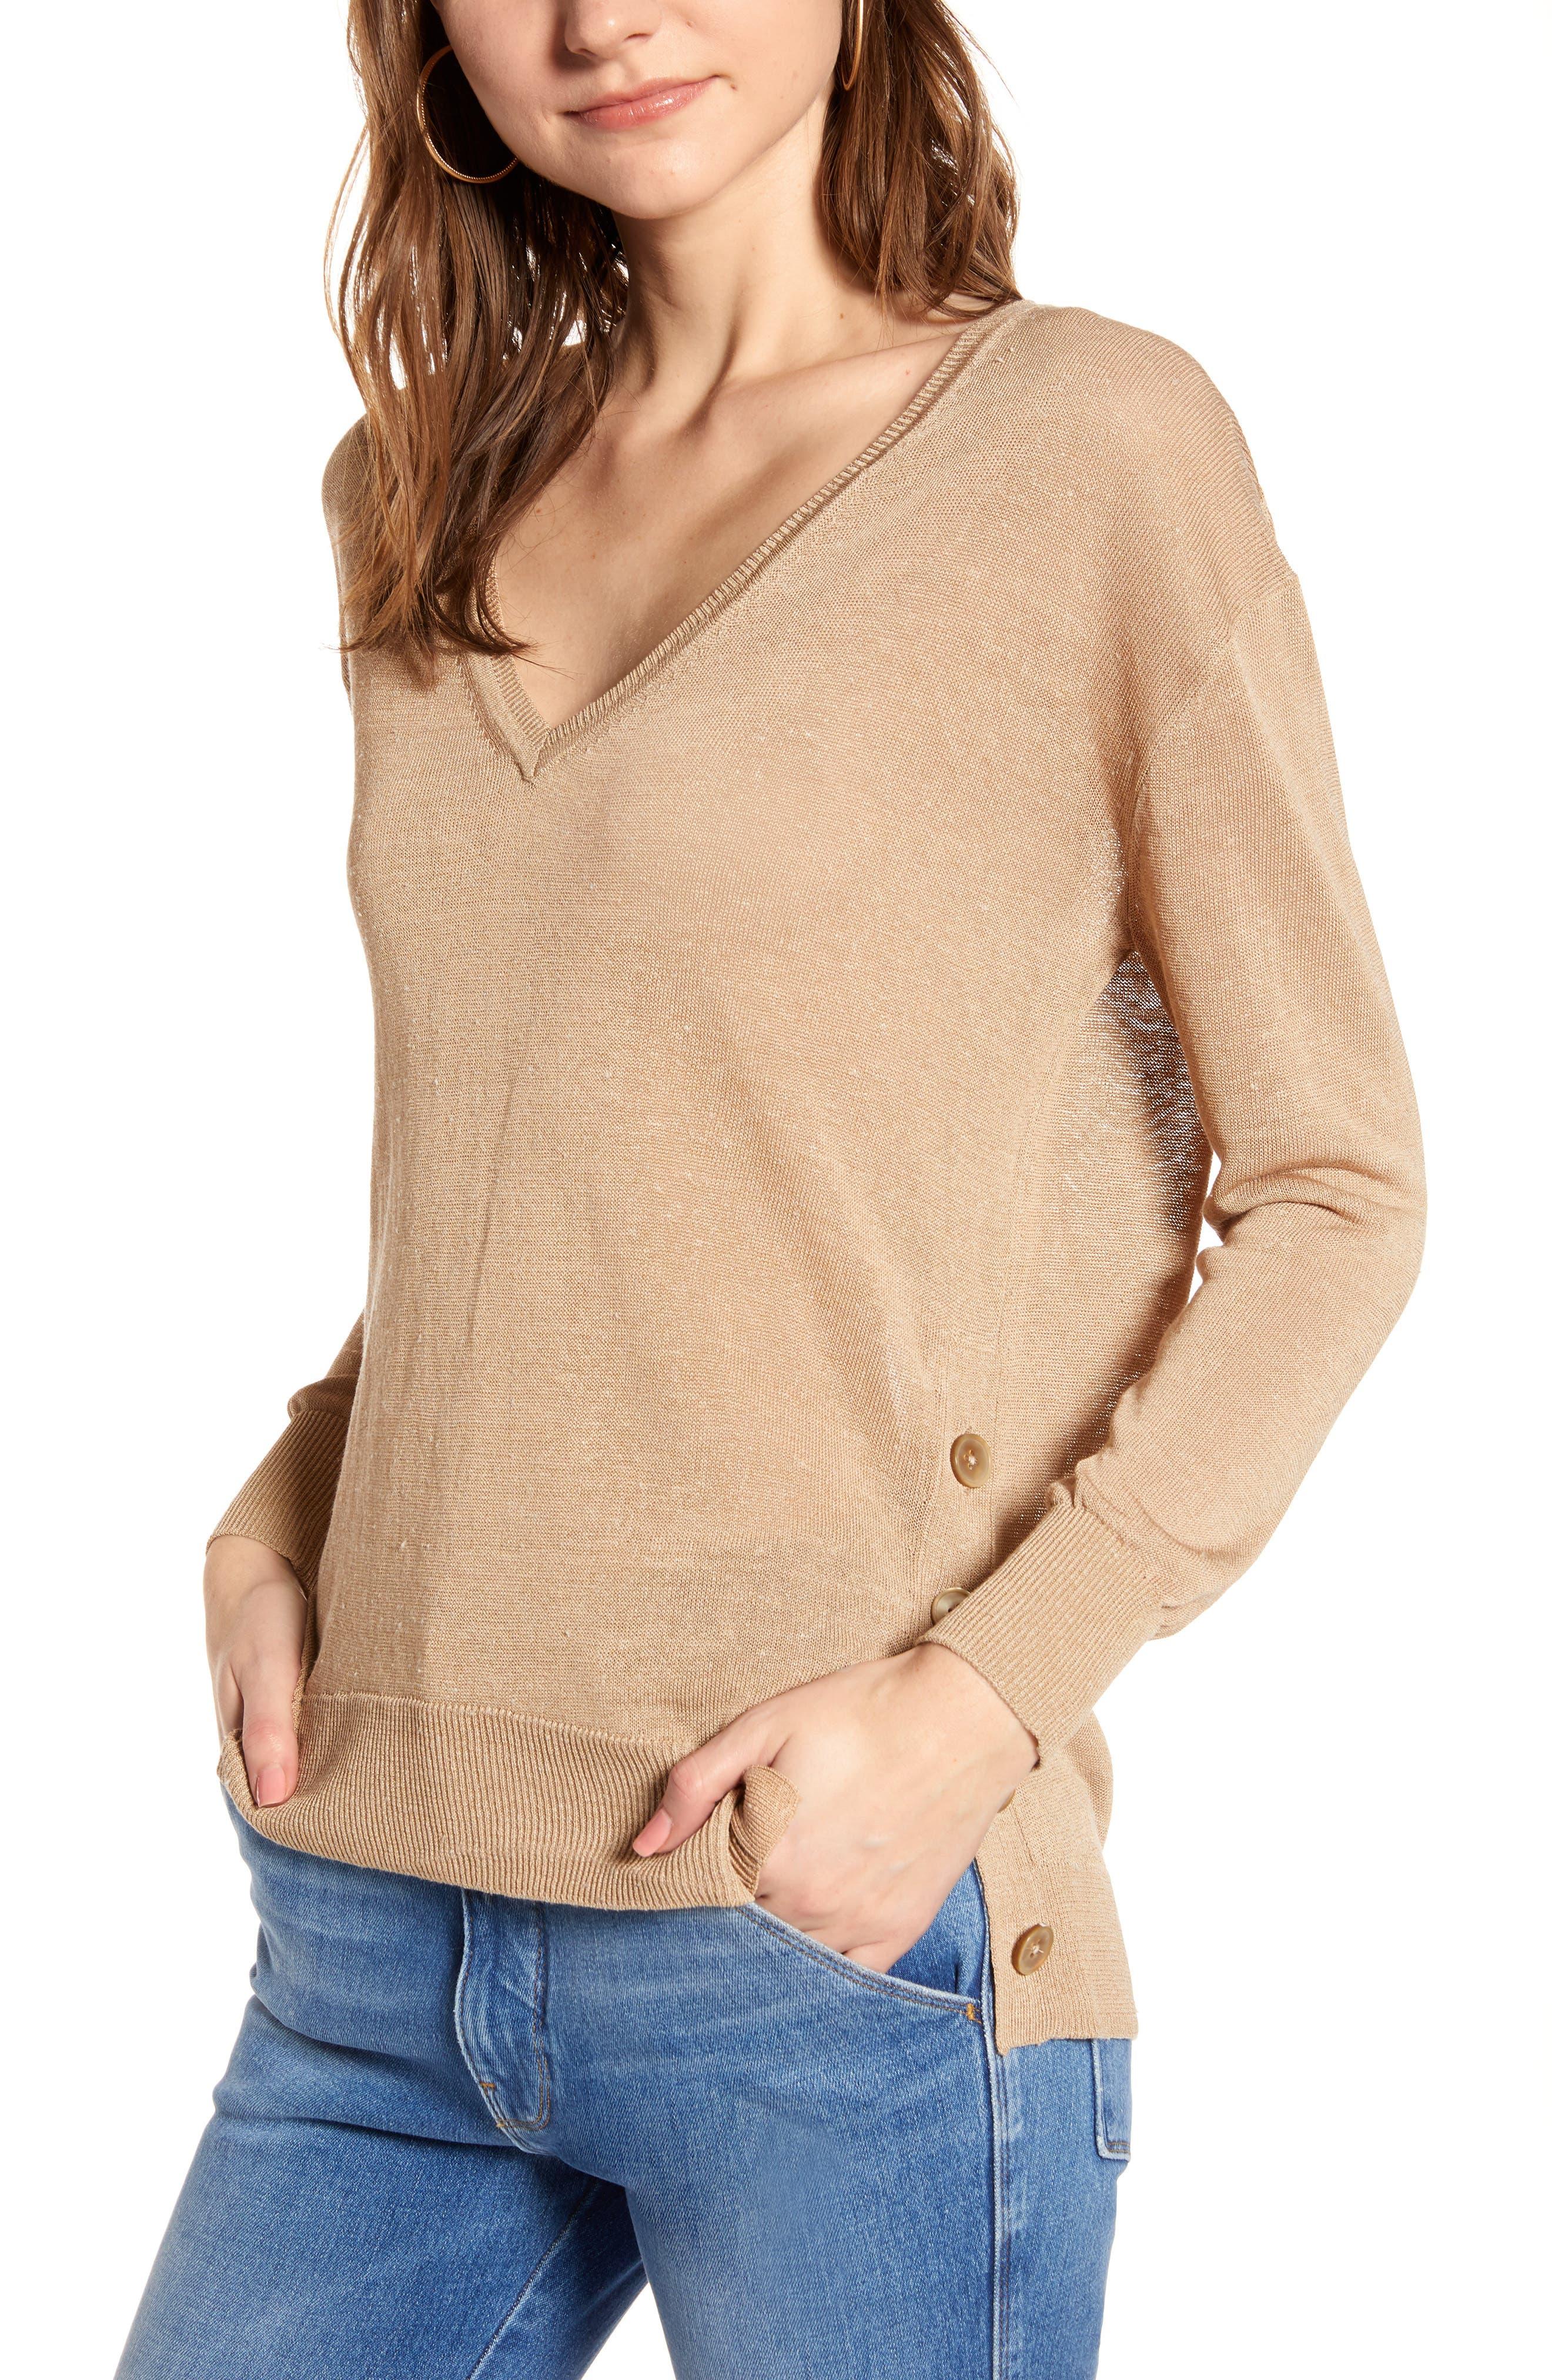 J.crew Side Button Linen Blend V-Neck Sweater, Beige